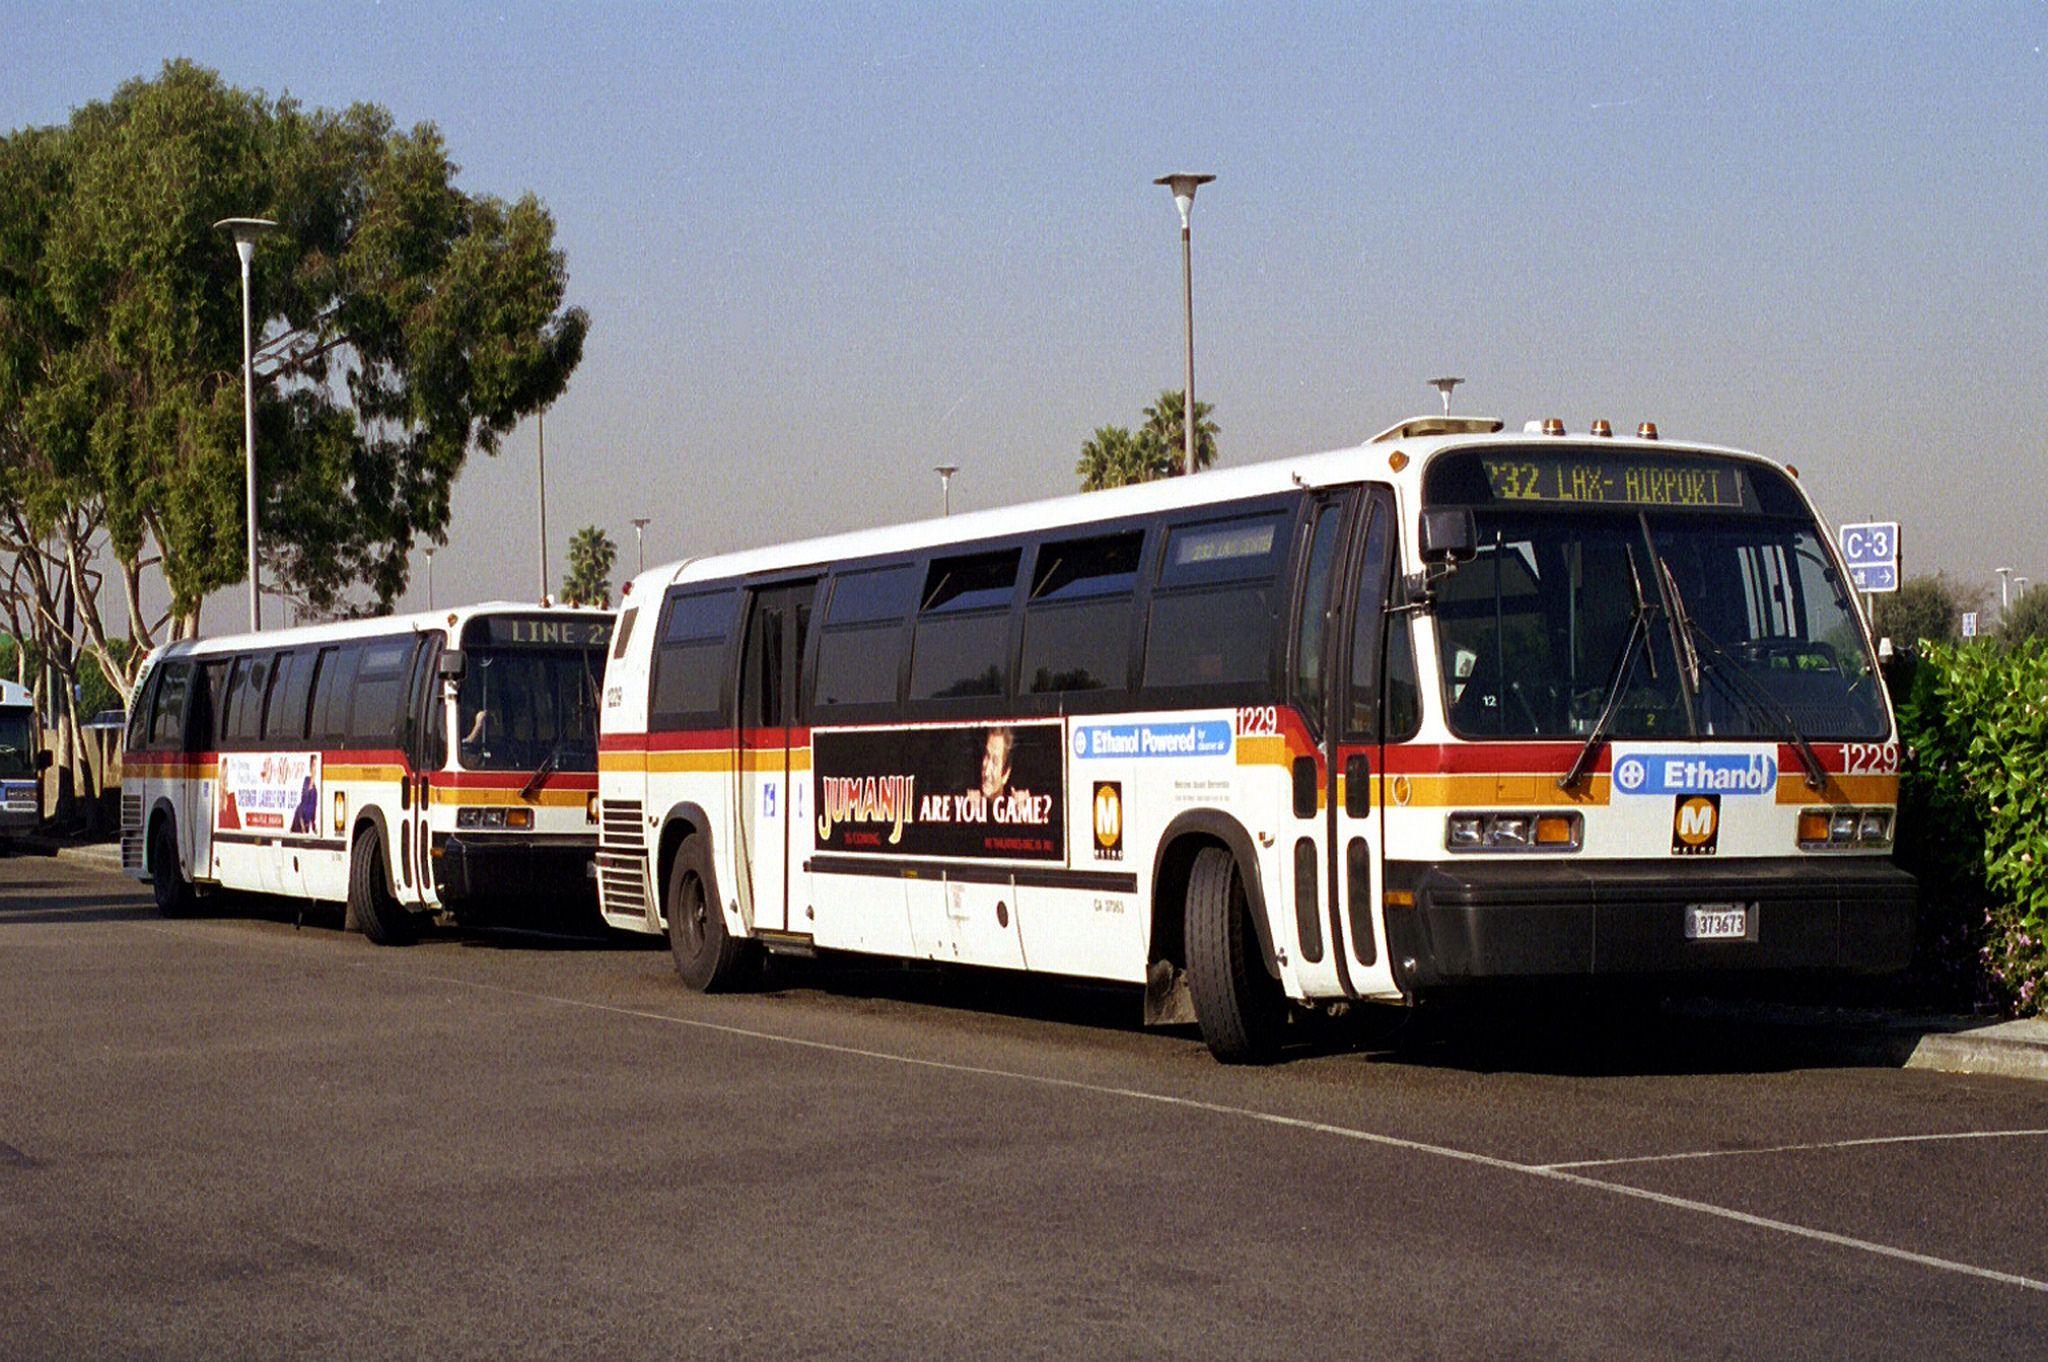 Ca lacmta 1229 1995 tmc rts ethanol at lax bus stn